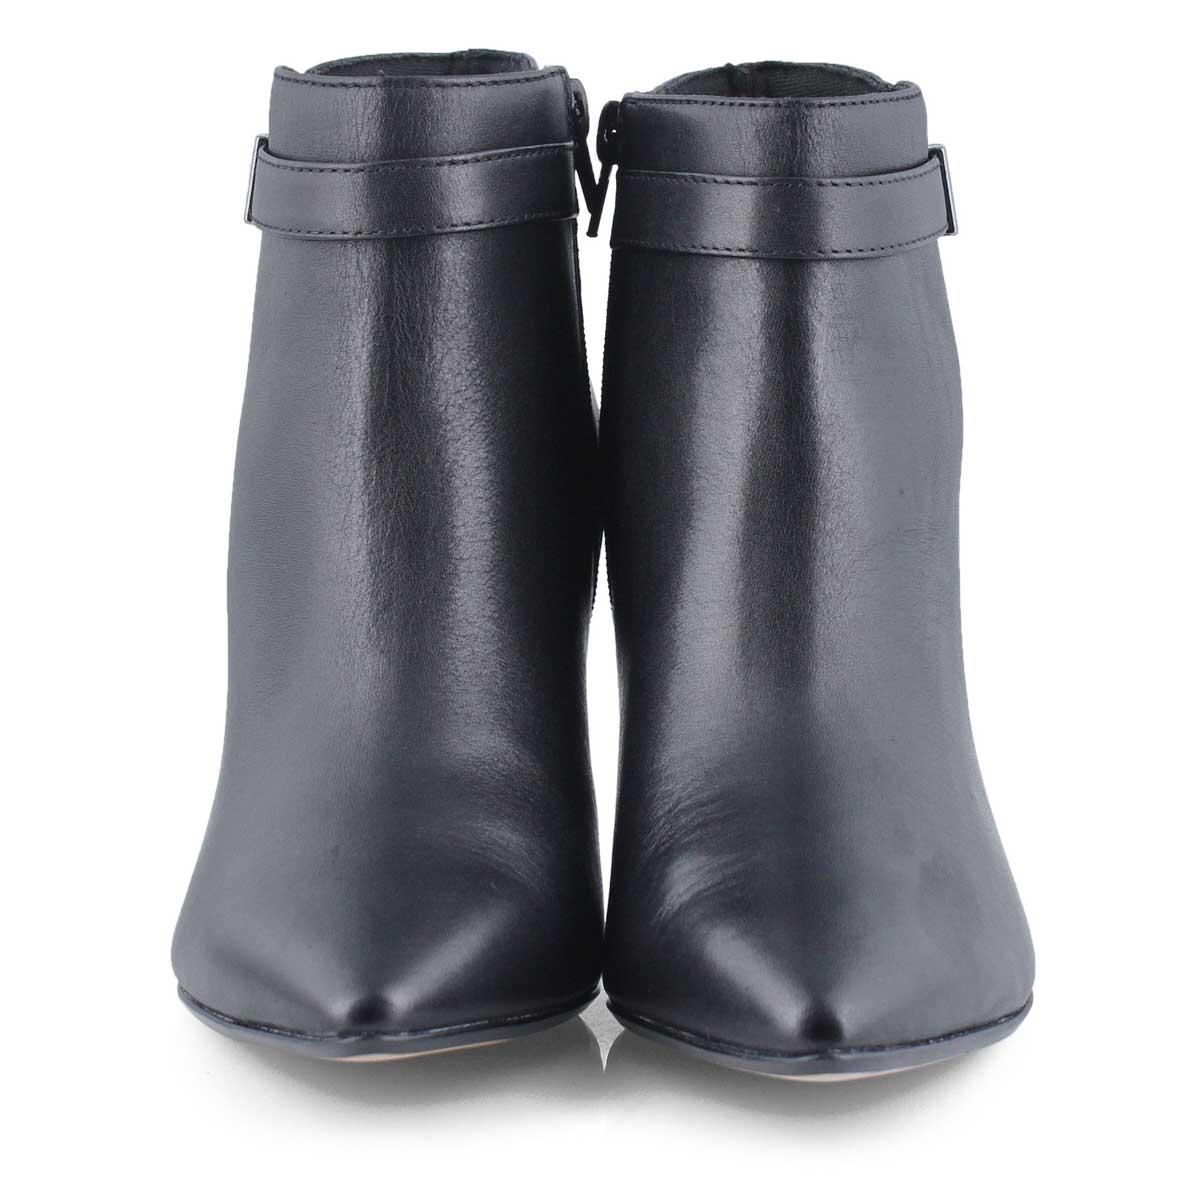 Lds Illeana Calla black ankle boot